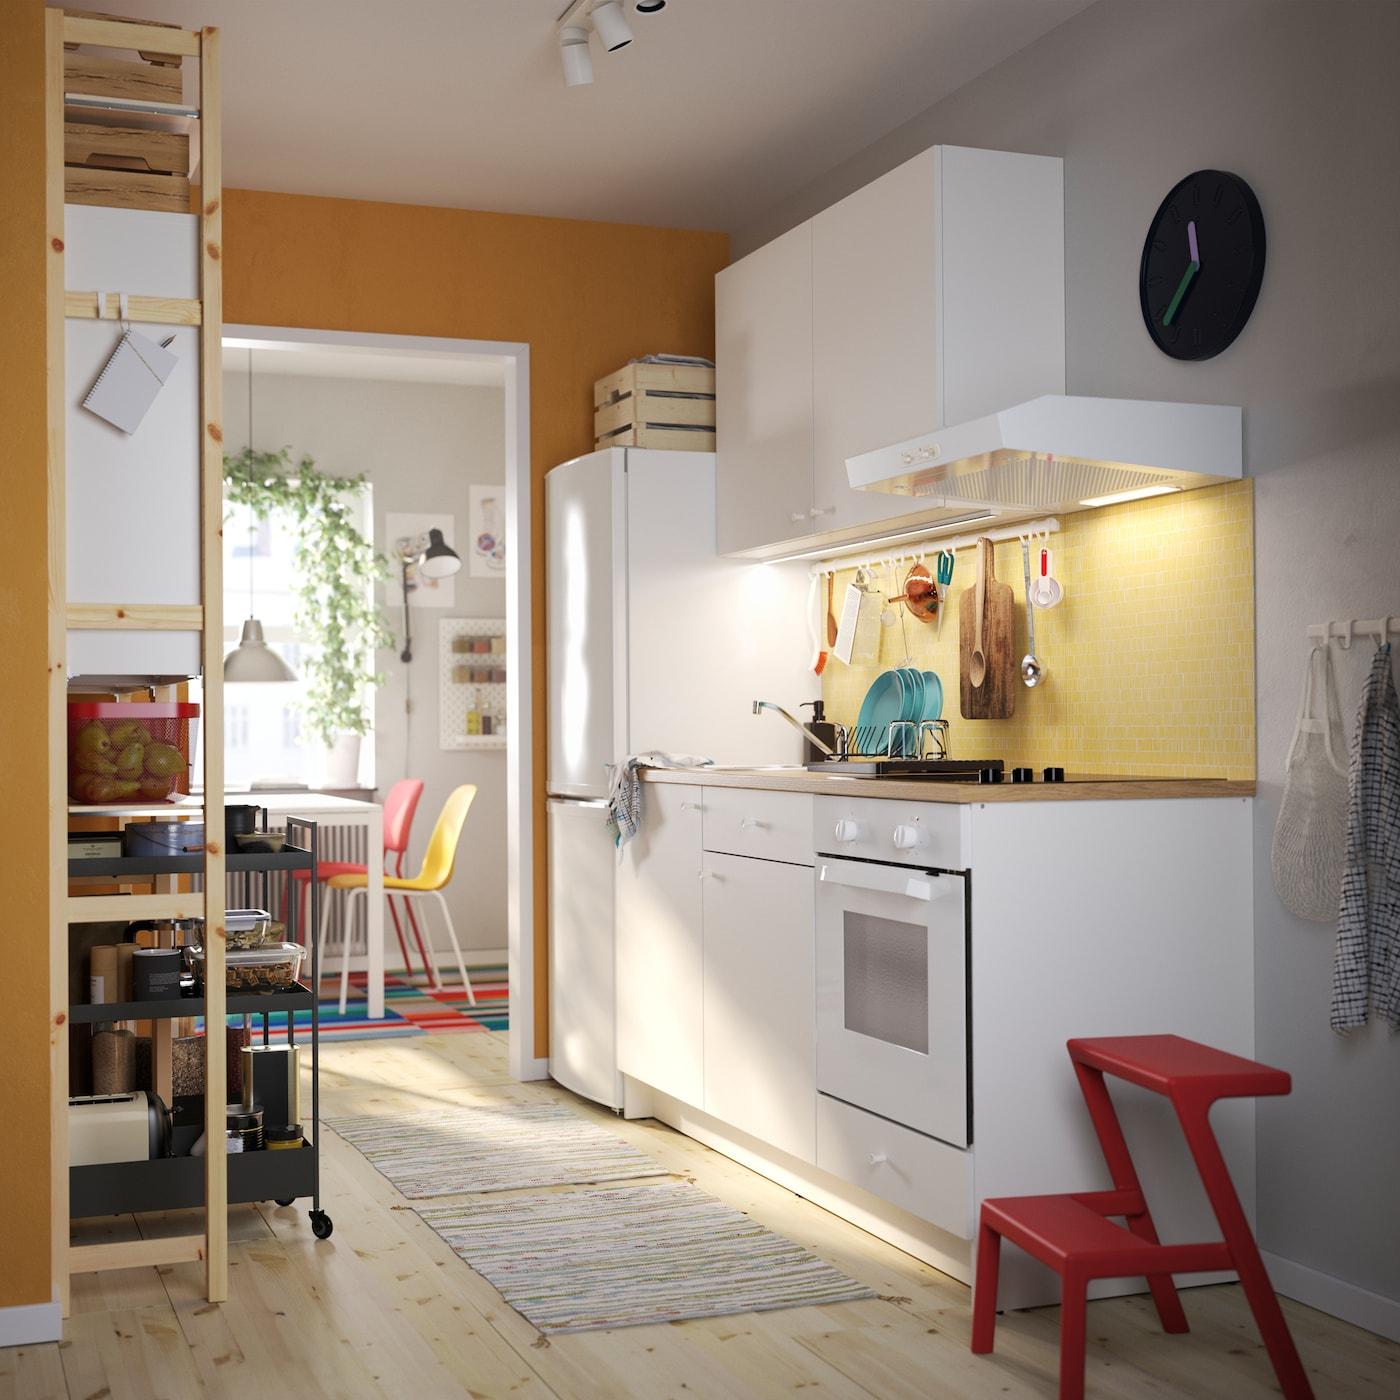 KNOXHULT 诺克胡 白色厨房、红色踏脚凳、松木搁架单元、黑色手推车及五彩缤纷的厨房椅子。